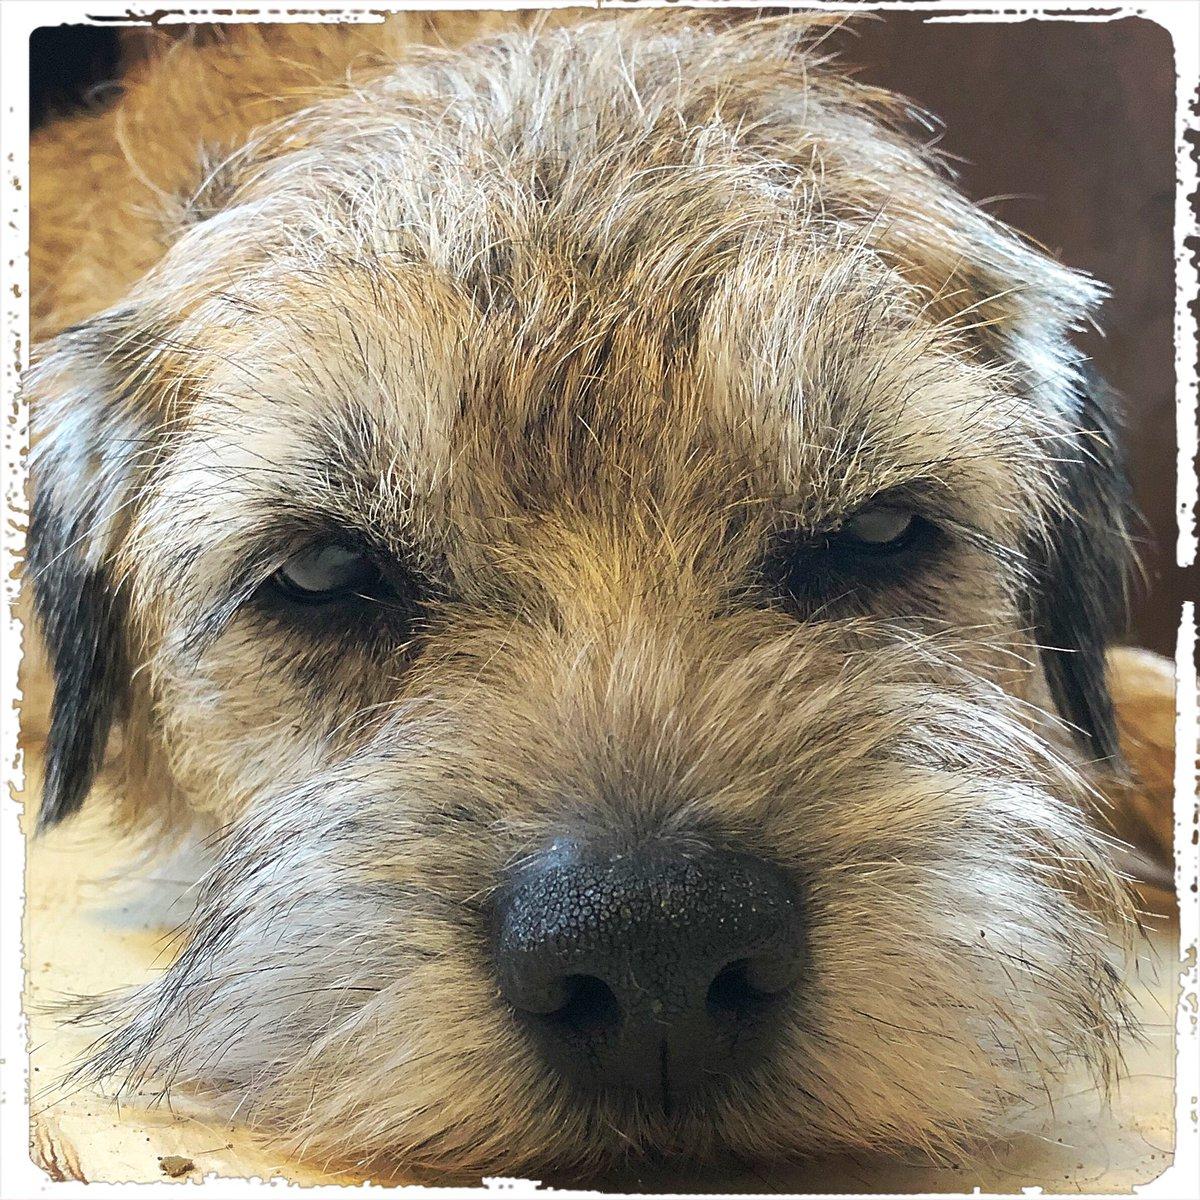 It's Jonny on #happyfriday  .  #doglover #ilovemydog #instadog  #meinhund #dogs_of_world #dogsearth #puppies #hund #hundeliebe #dog #dogislove #trustrespectlove #hundeland #hundeblog #lieblingshund #lebenmithund #fellnase  #besterhund #dogsneeddogs #doggy #dogs #besterhundpic.twitter.com/g4fgC9DX3d